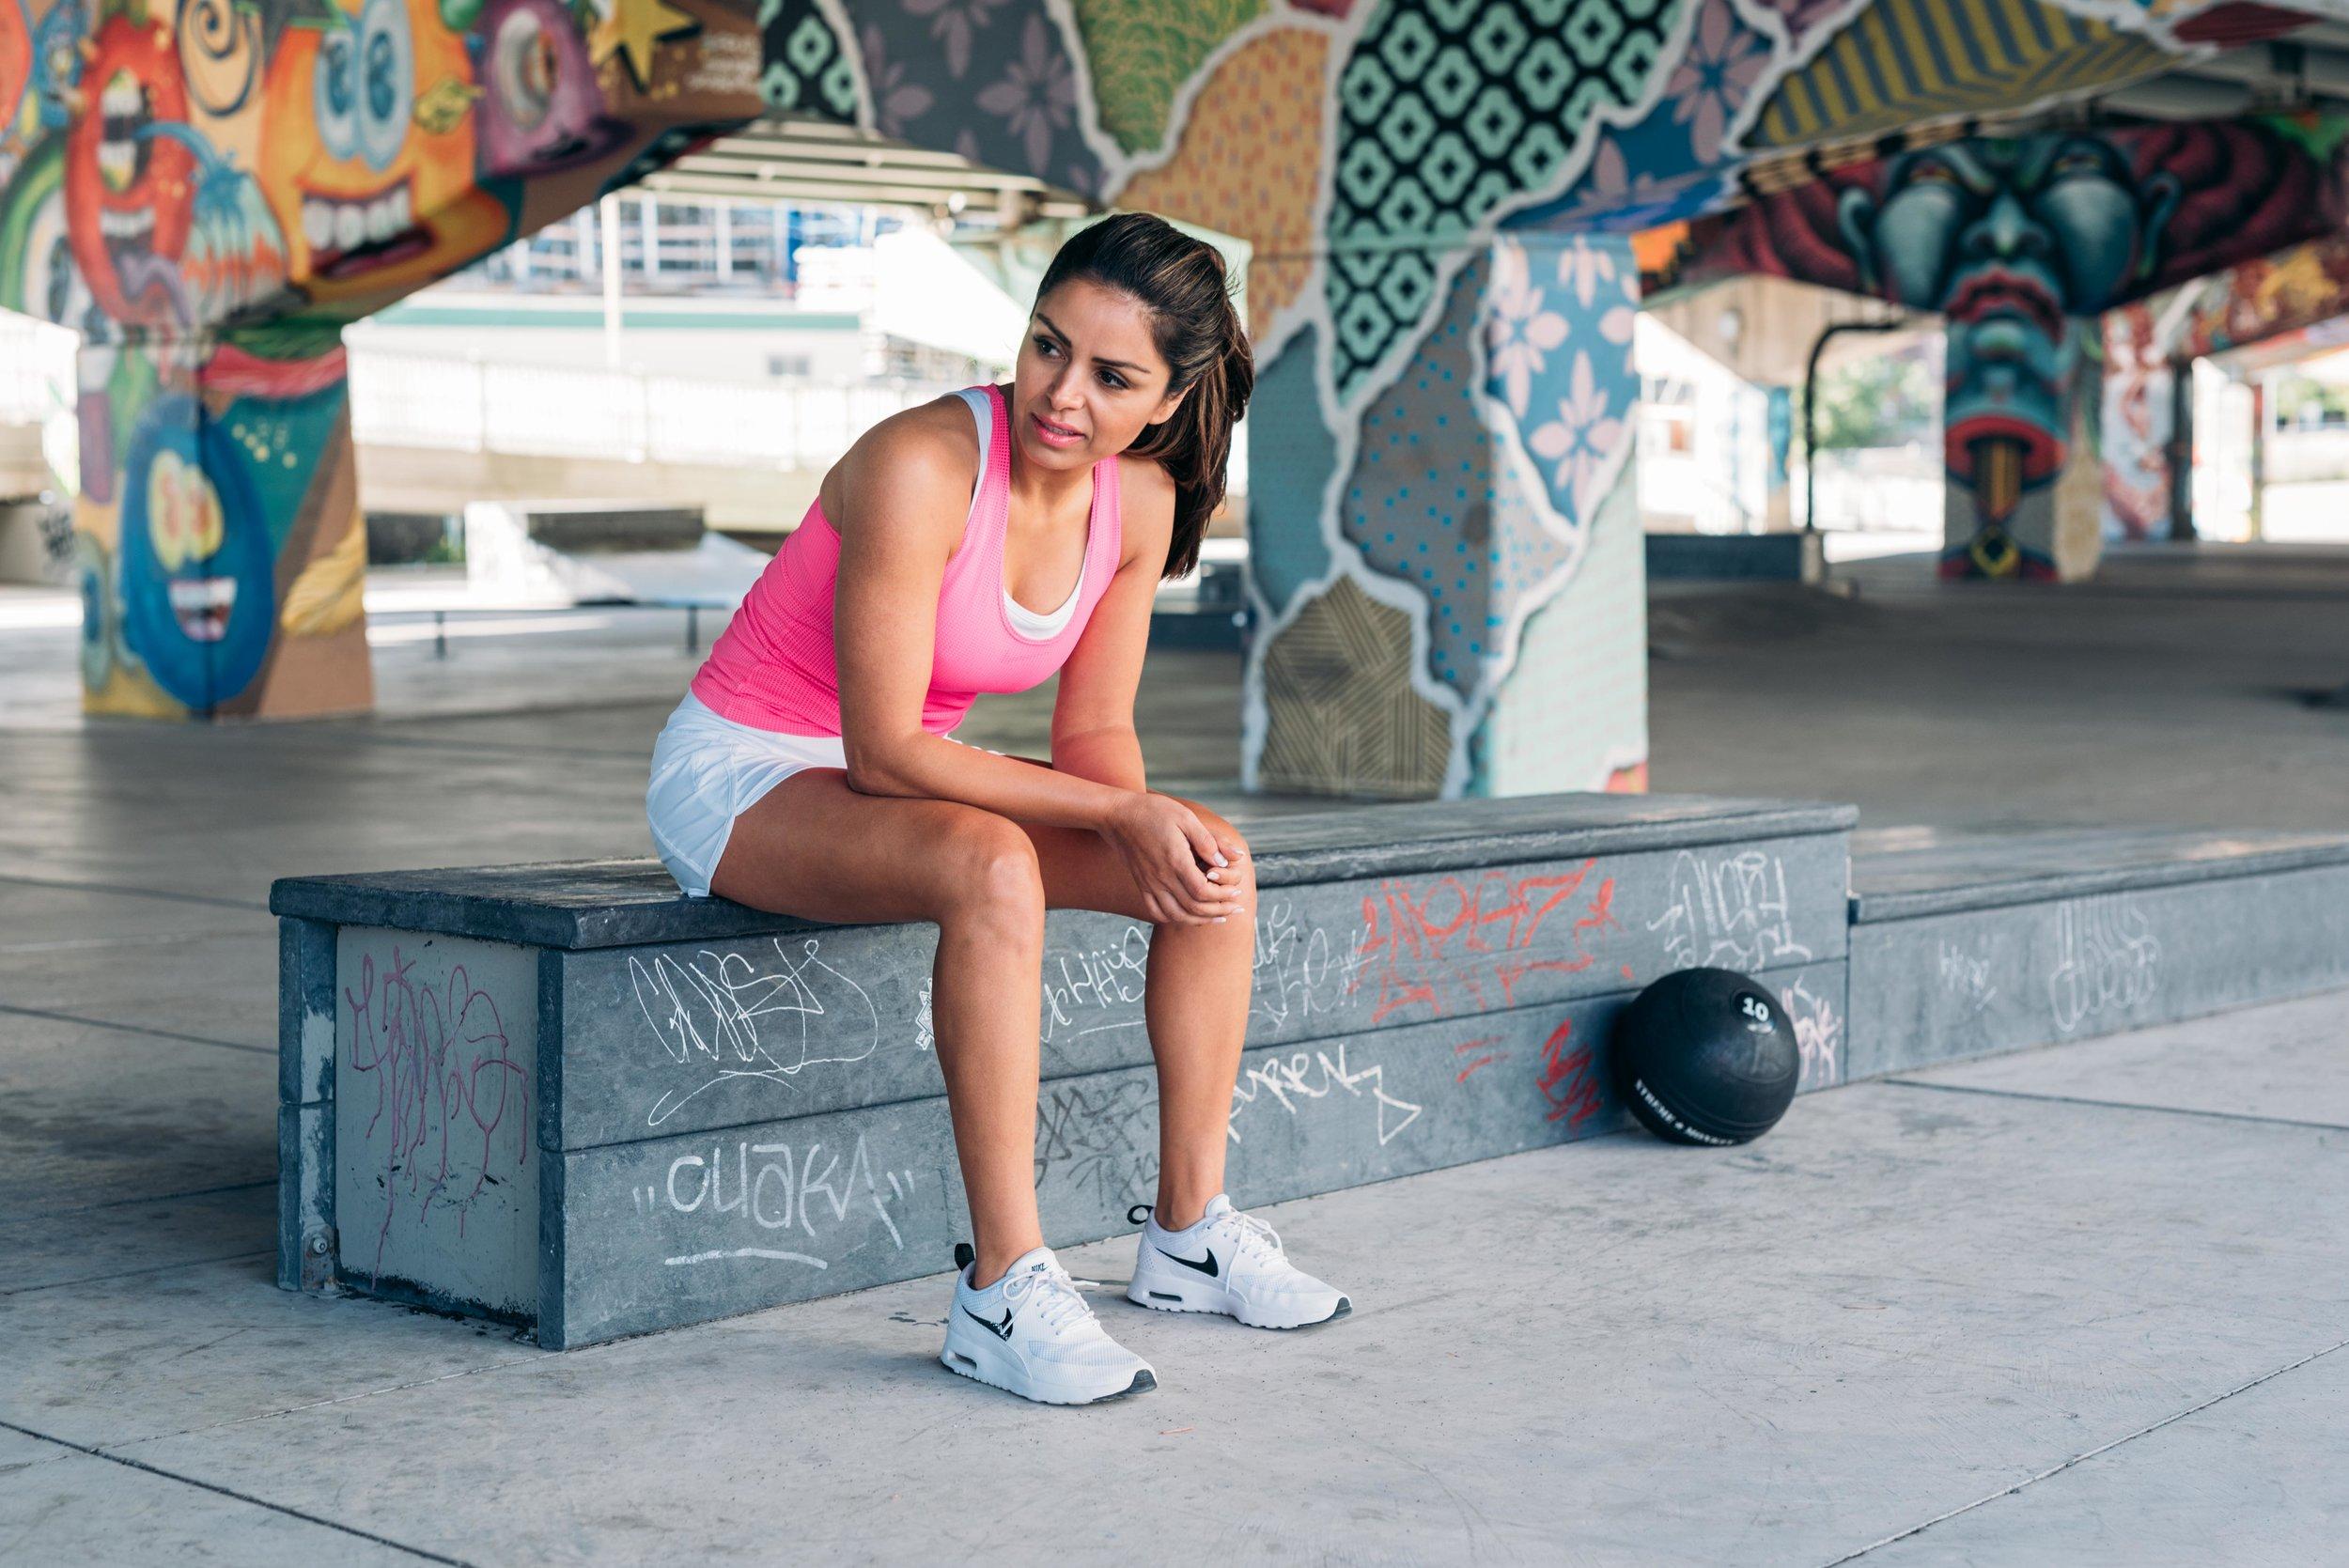 Elle Active Lifestyle WEB-8293.jpg